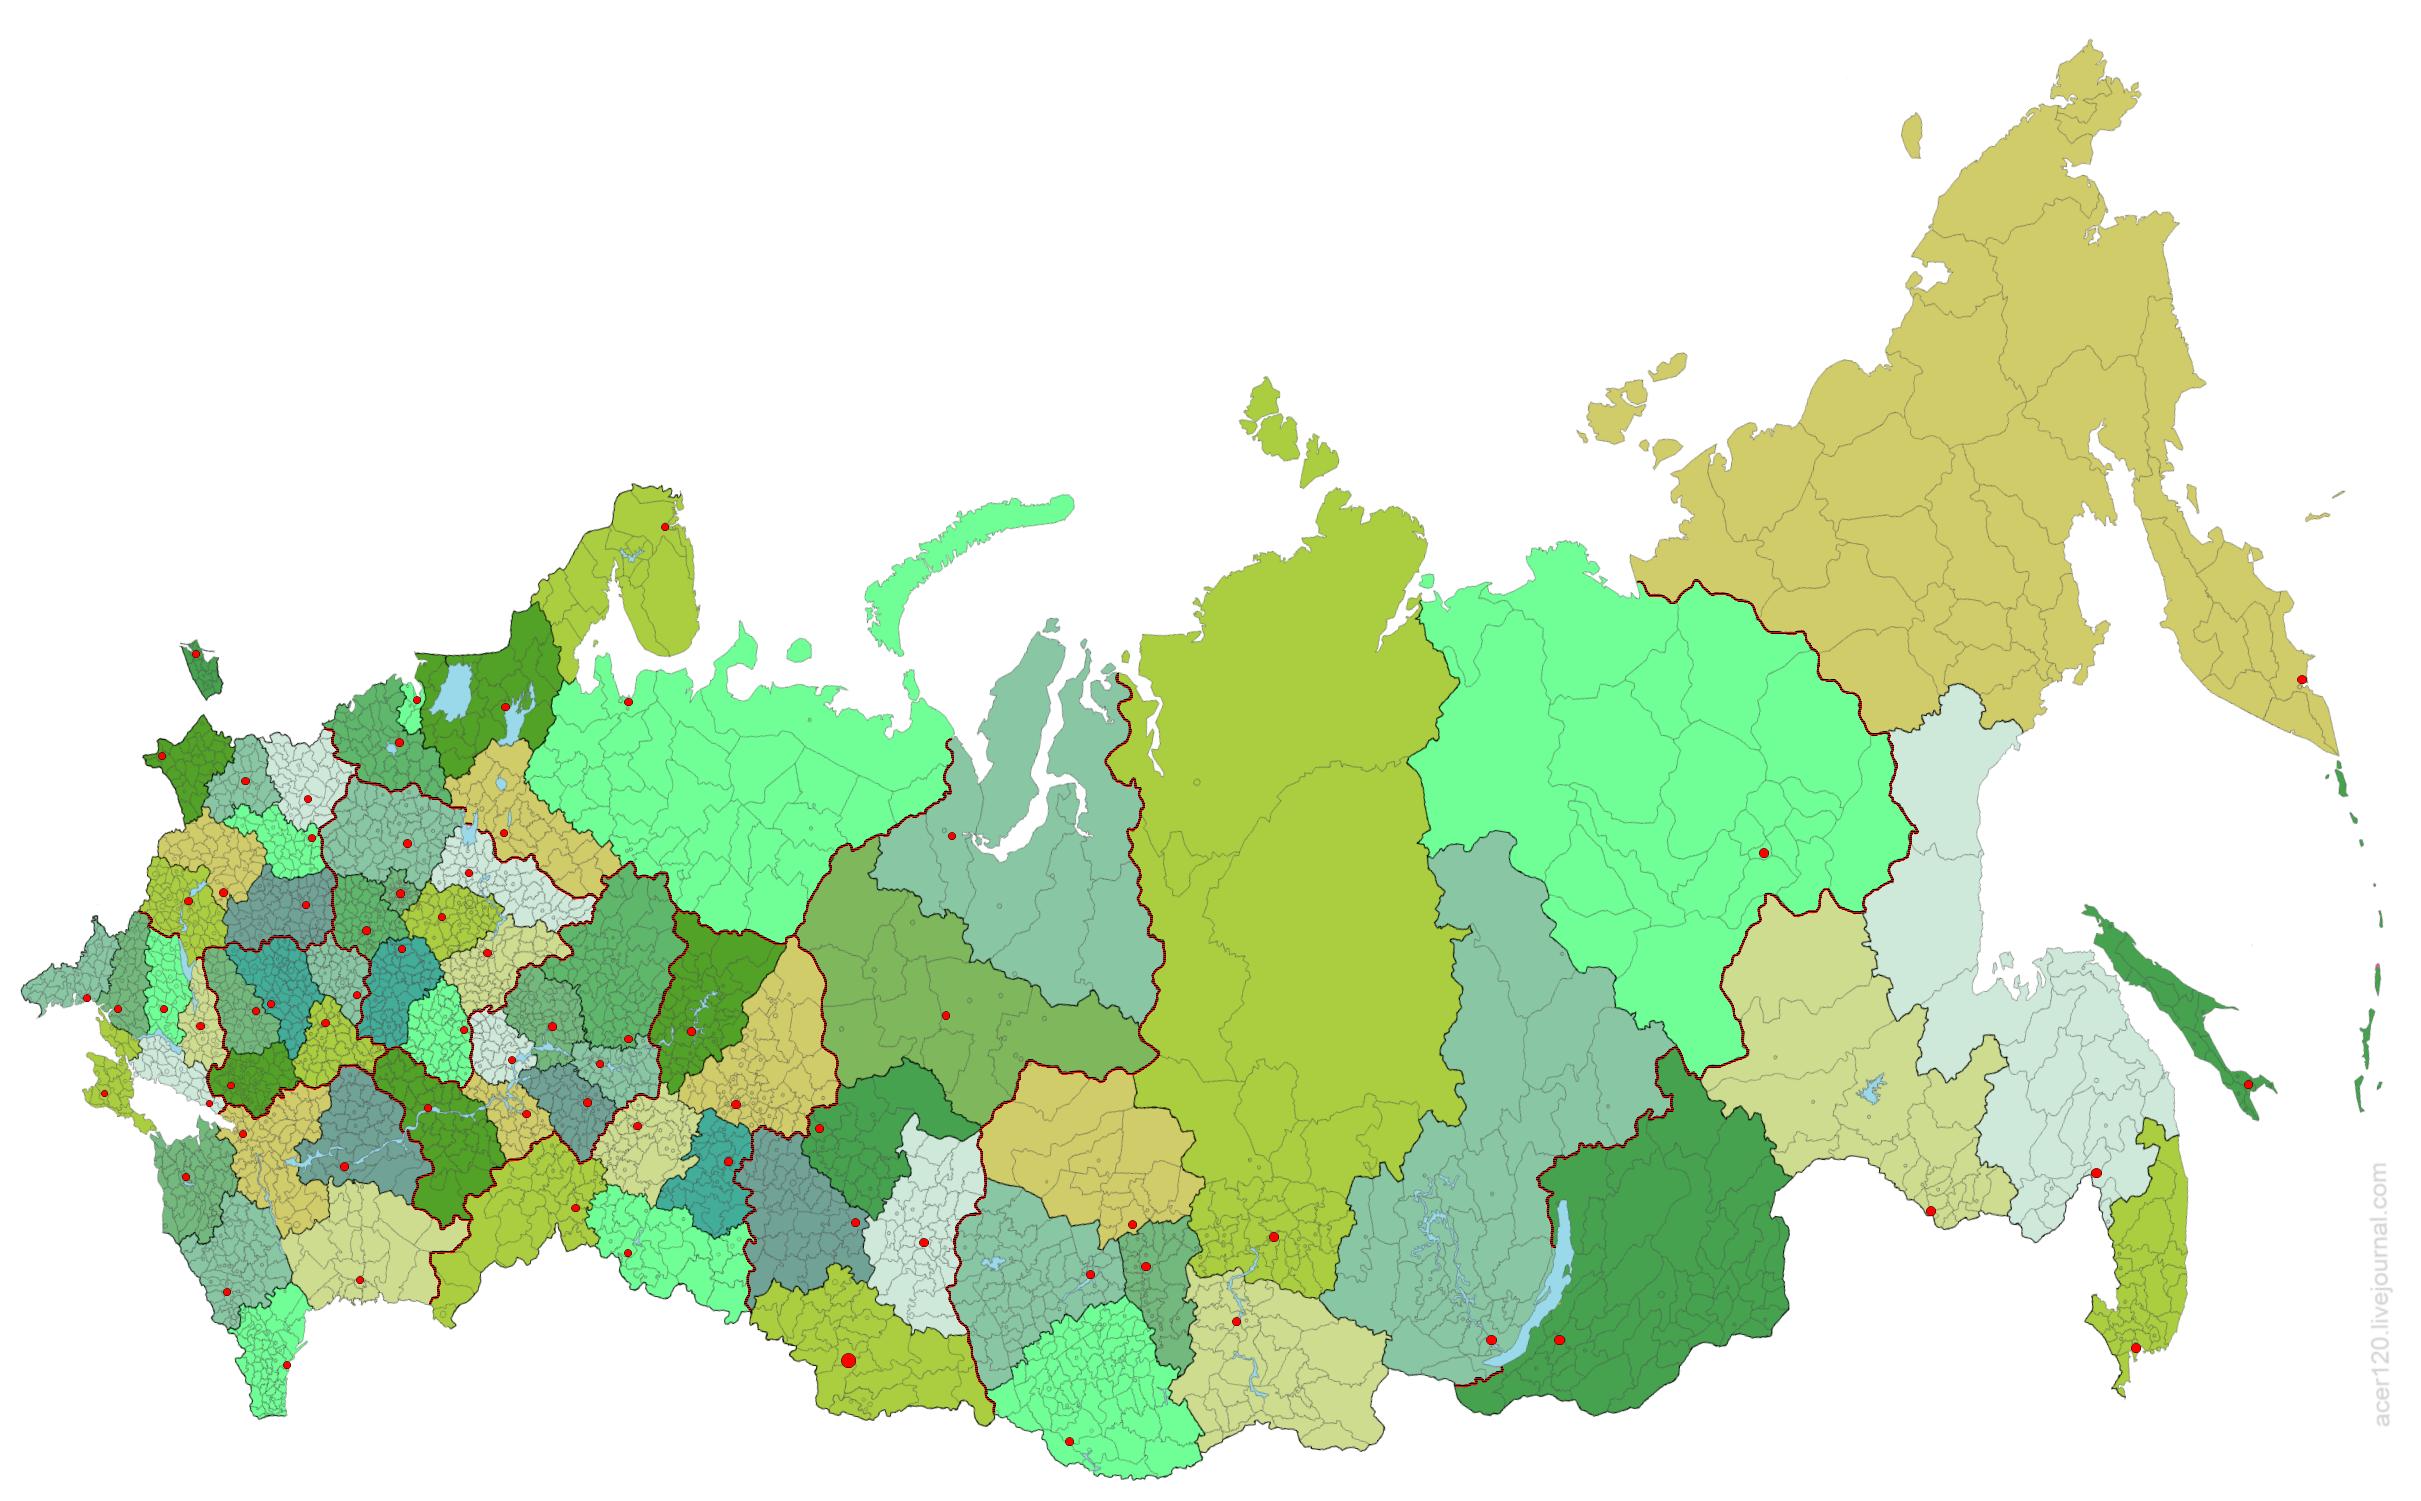 РР - регионы